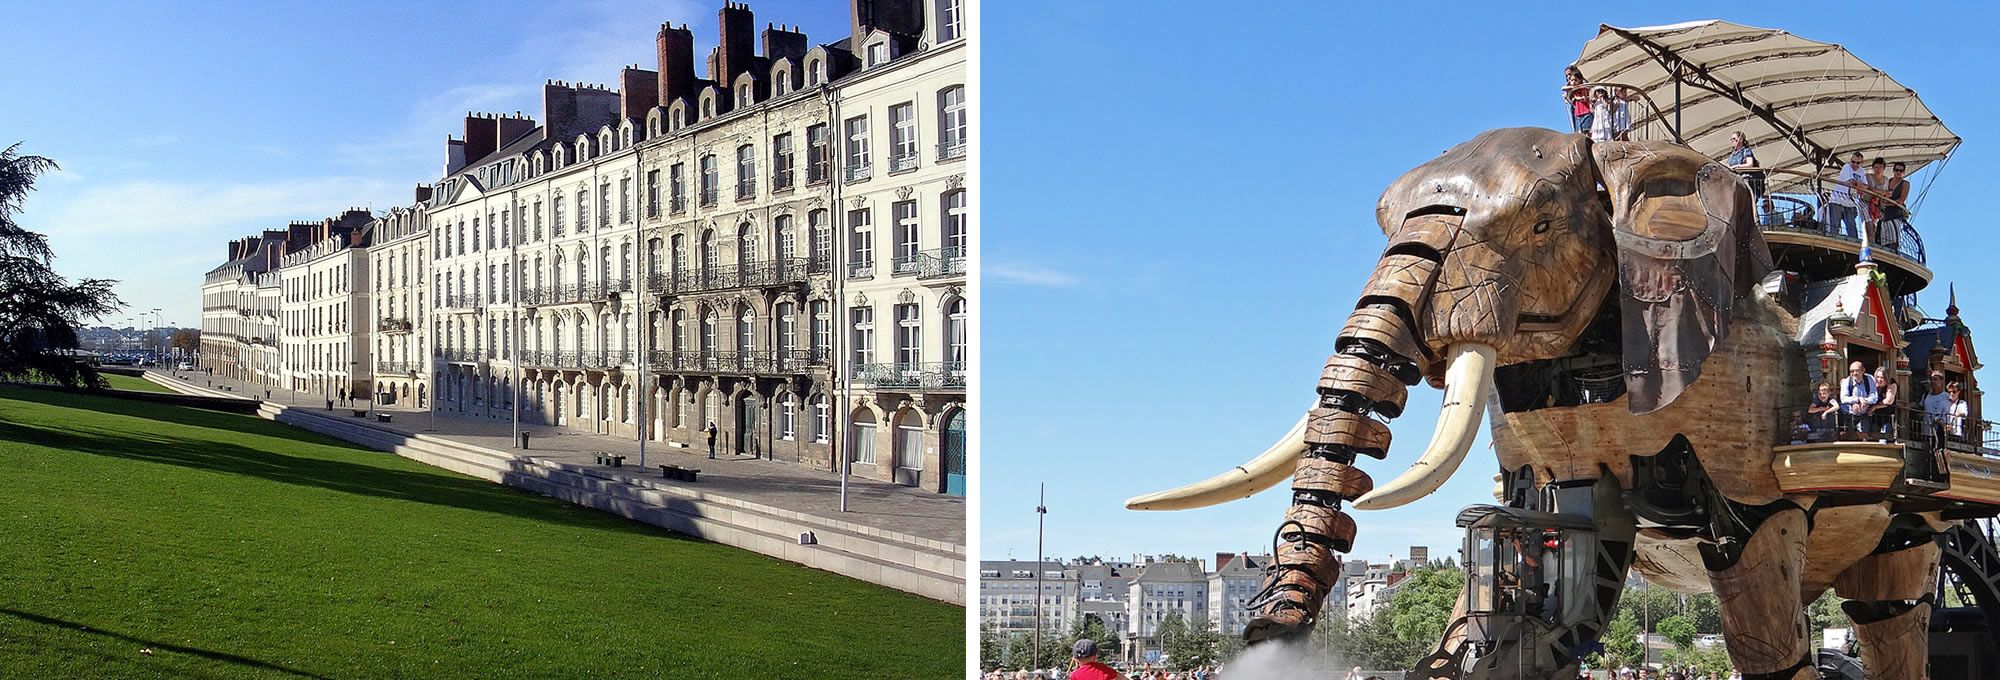 Que visiter à Nantes ?